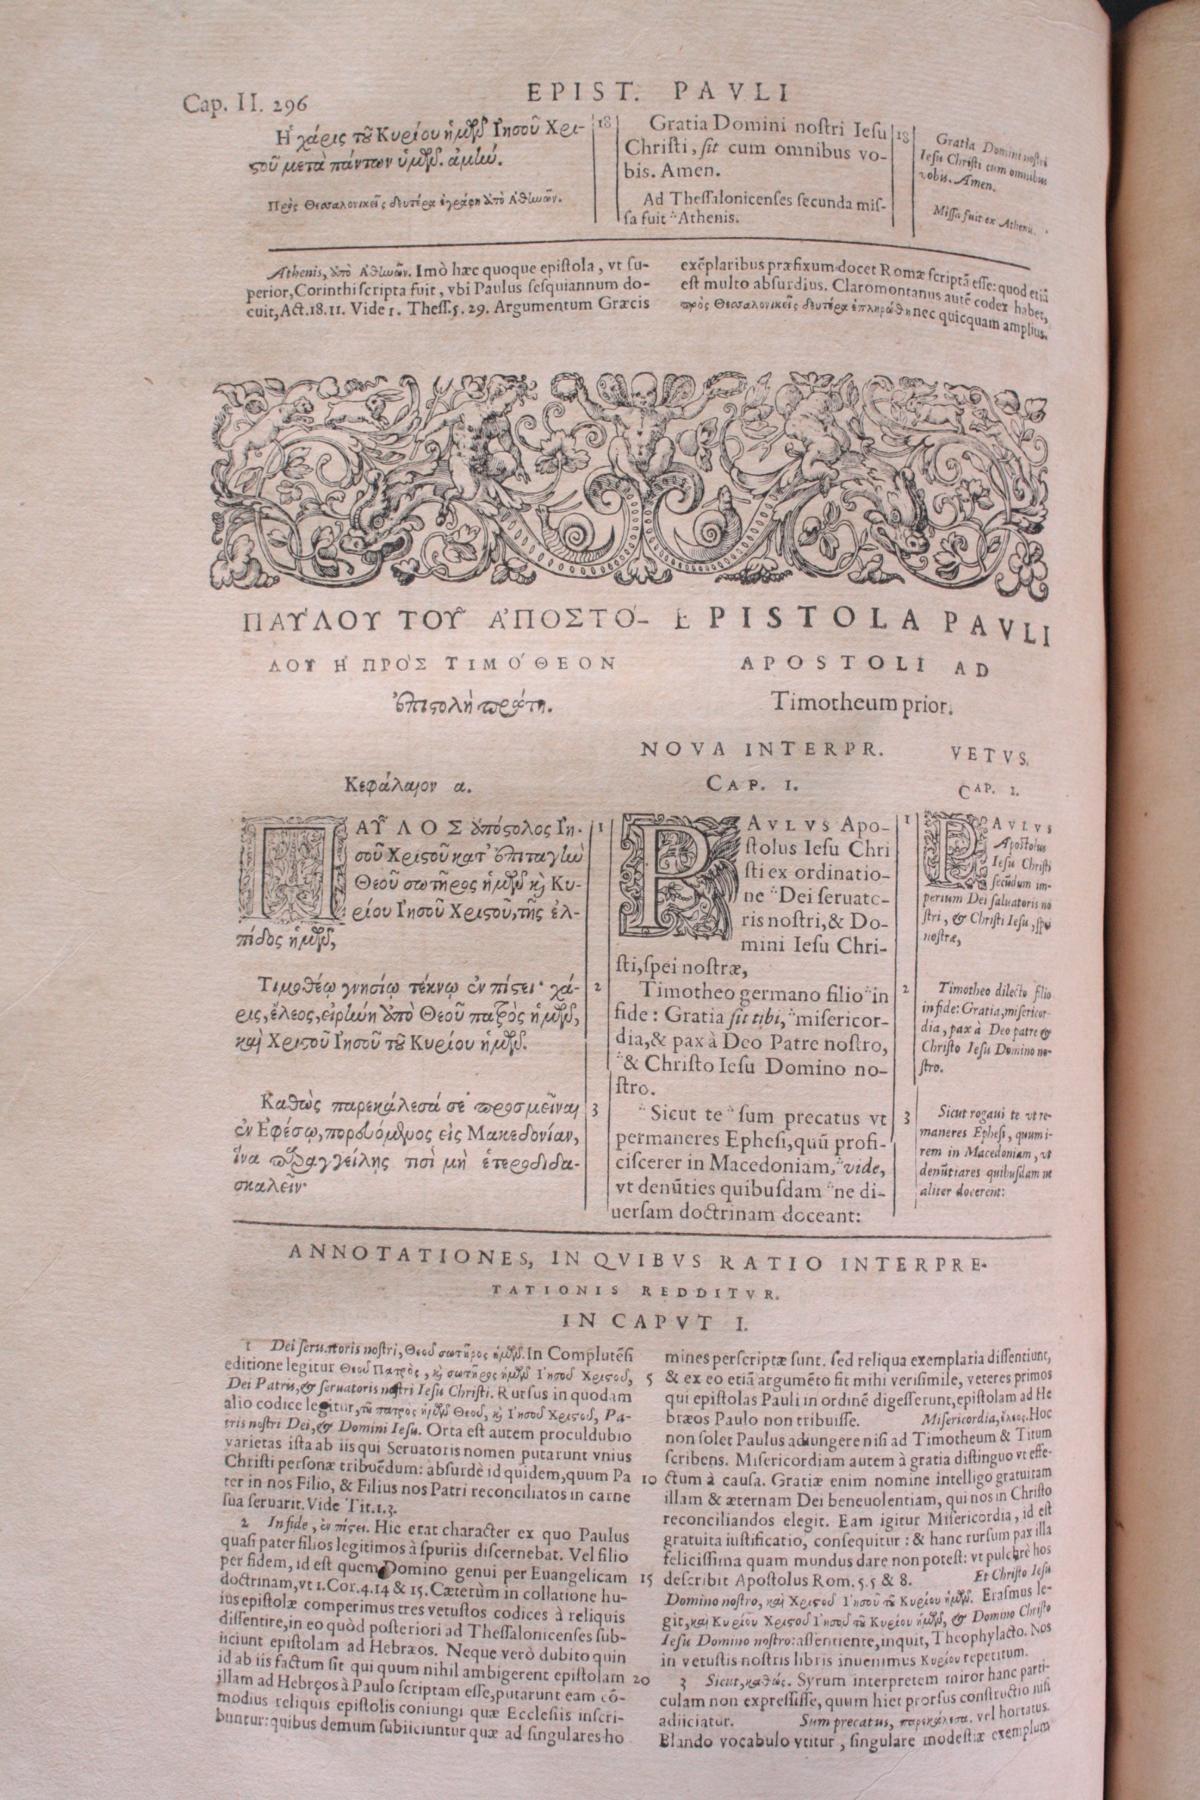 Griechische-Lateinische Bibel, Novum Testamentum 1582-14